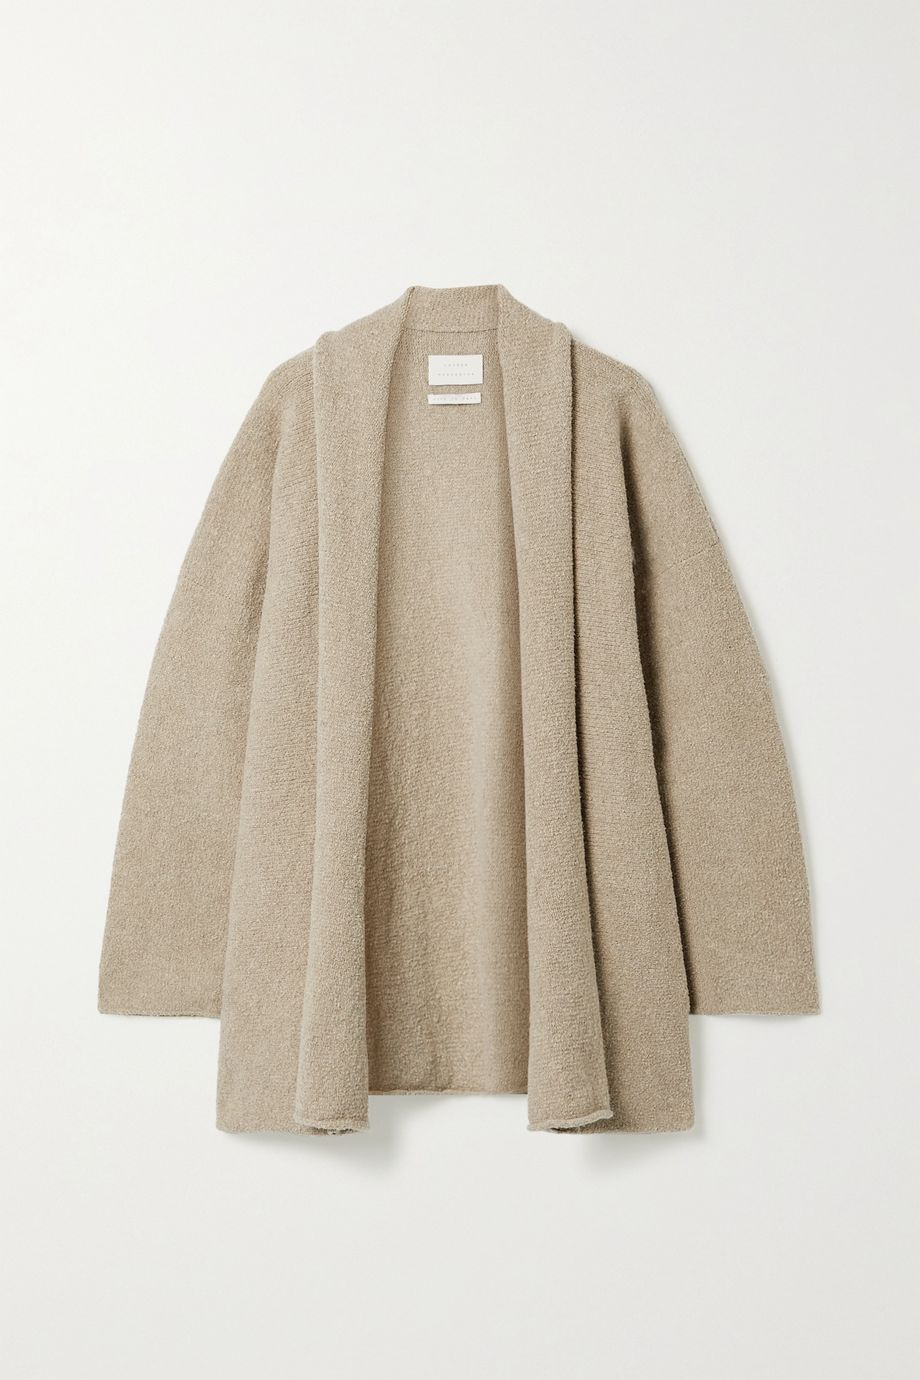 Lauren Manoogian Uzbek Pima cotton-blend cardigan